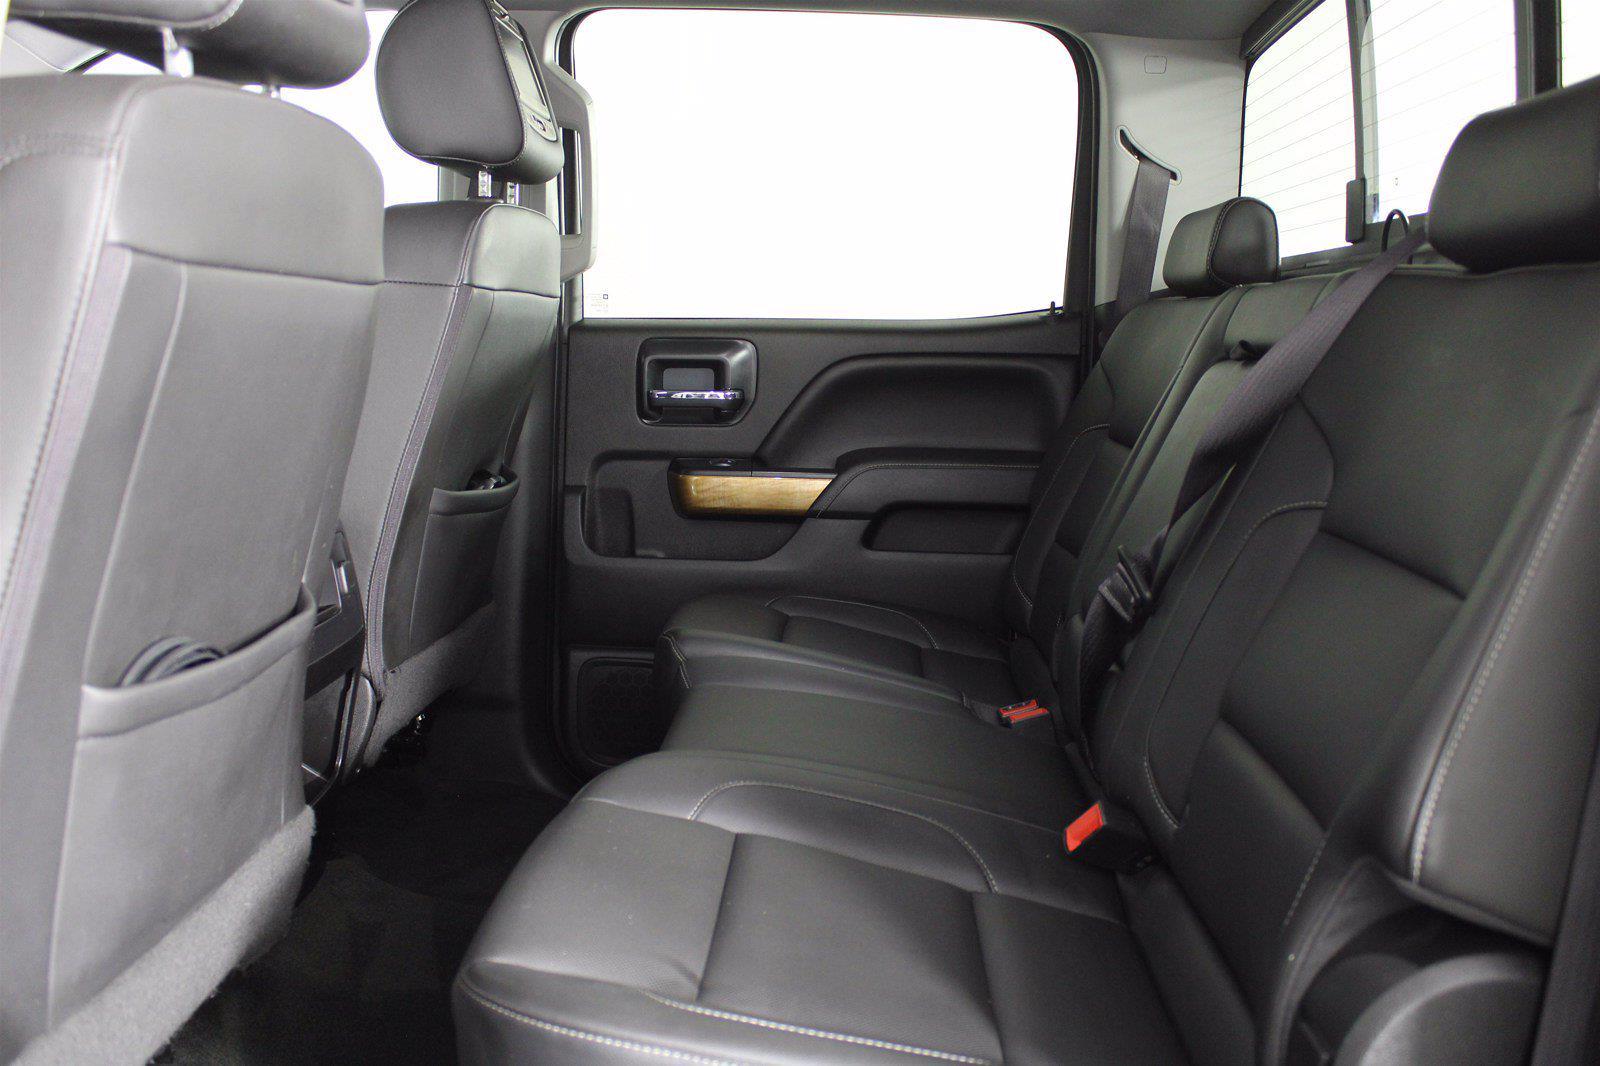 2016 Chevrolet Silverado 2500 Crew Cab 4x2, Pickup #D110630A - photo 8